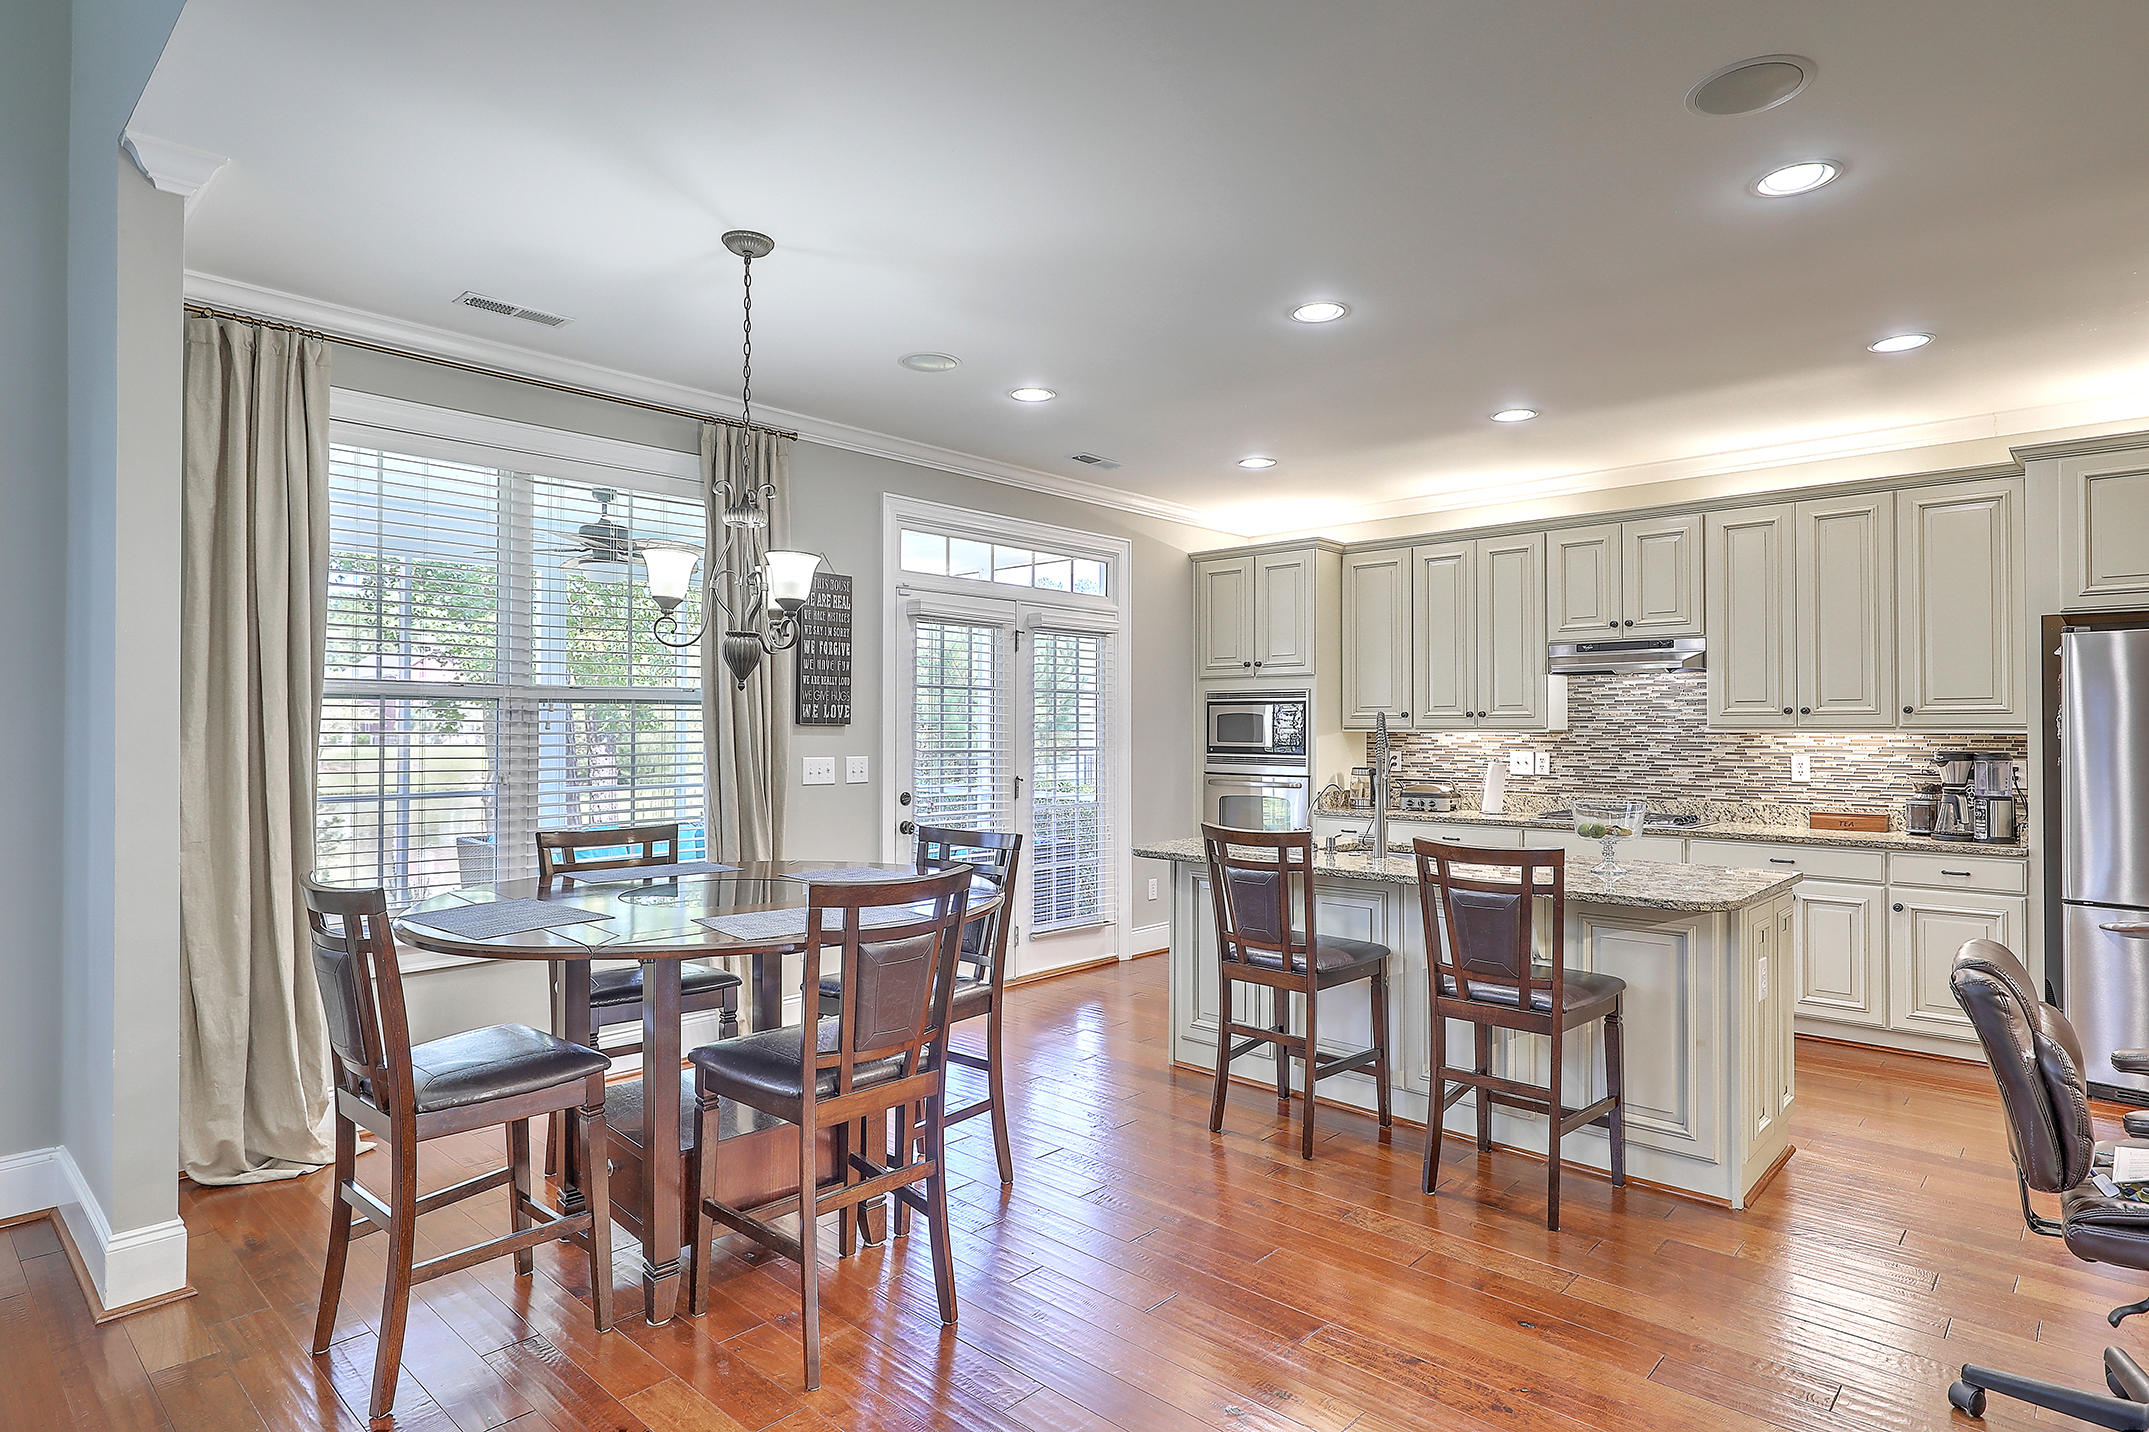 Branch Creek Homes For Sale - 304 Pond Hill, Summerville, SC - 8